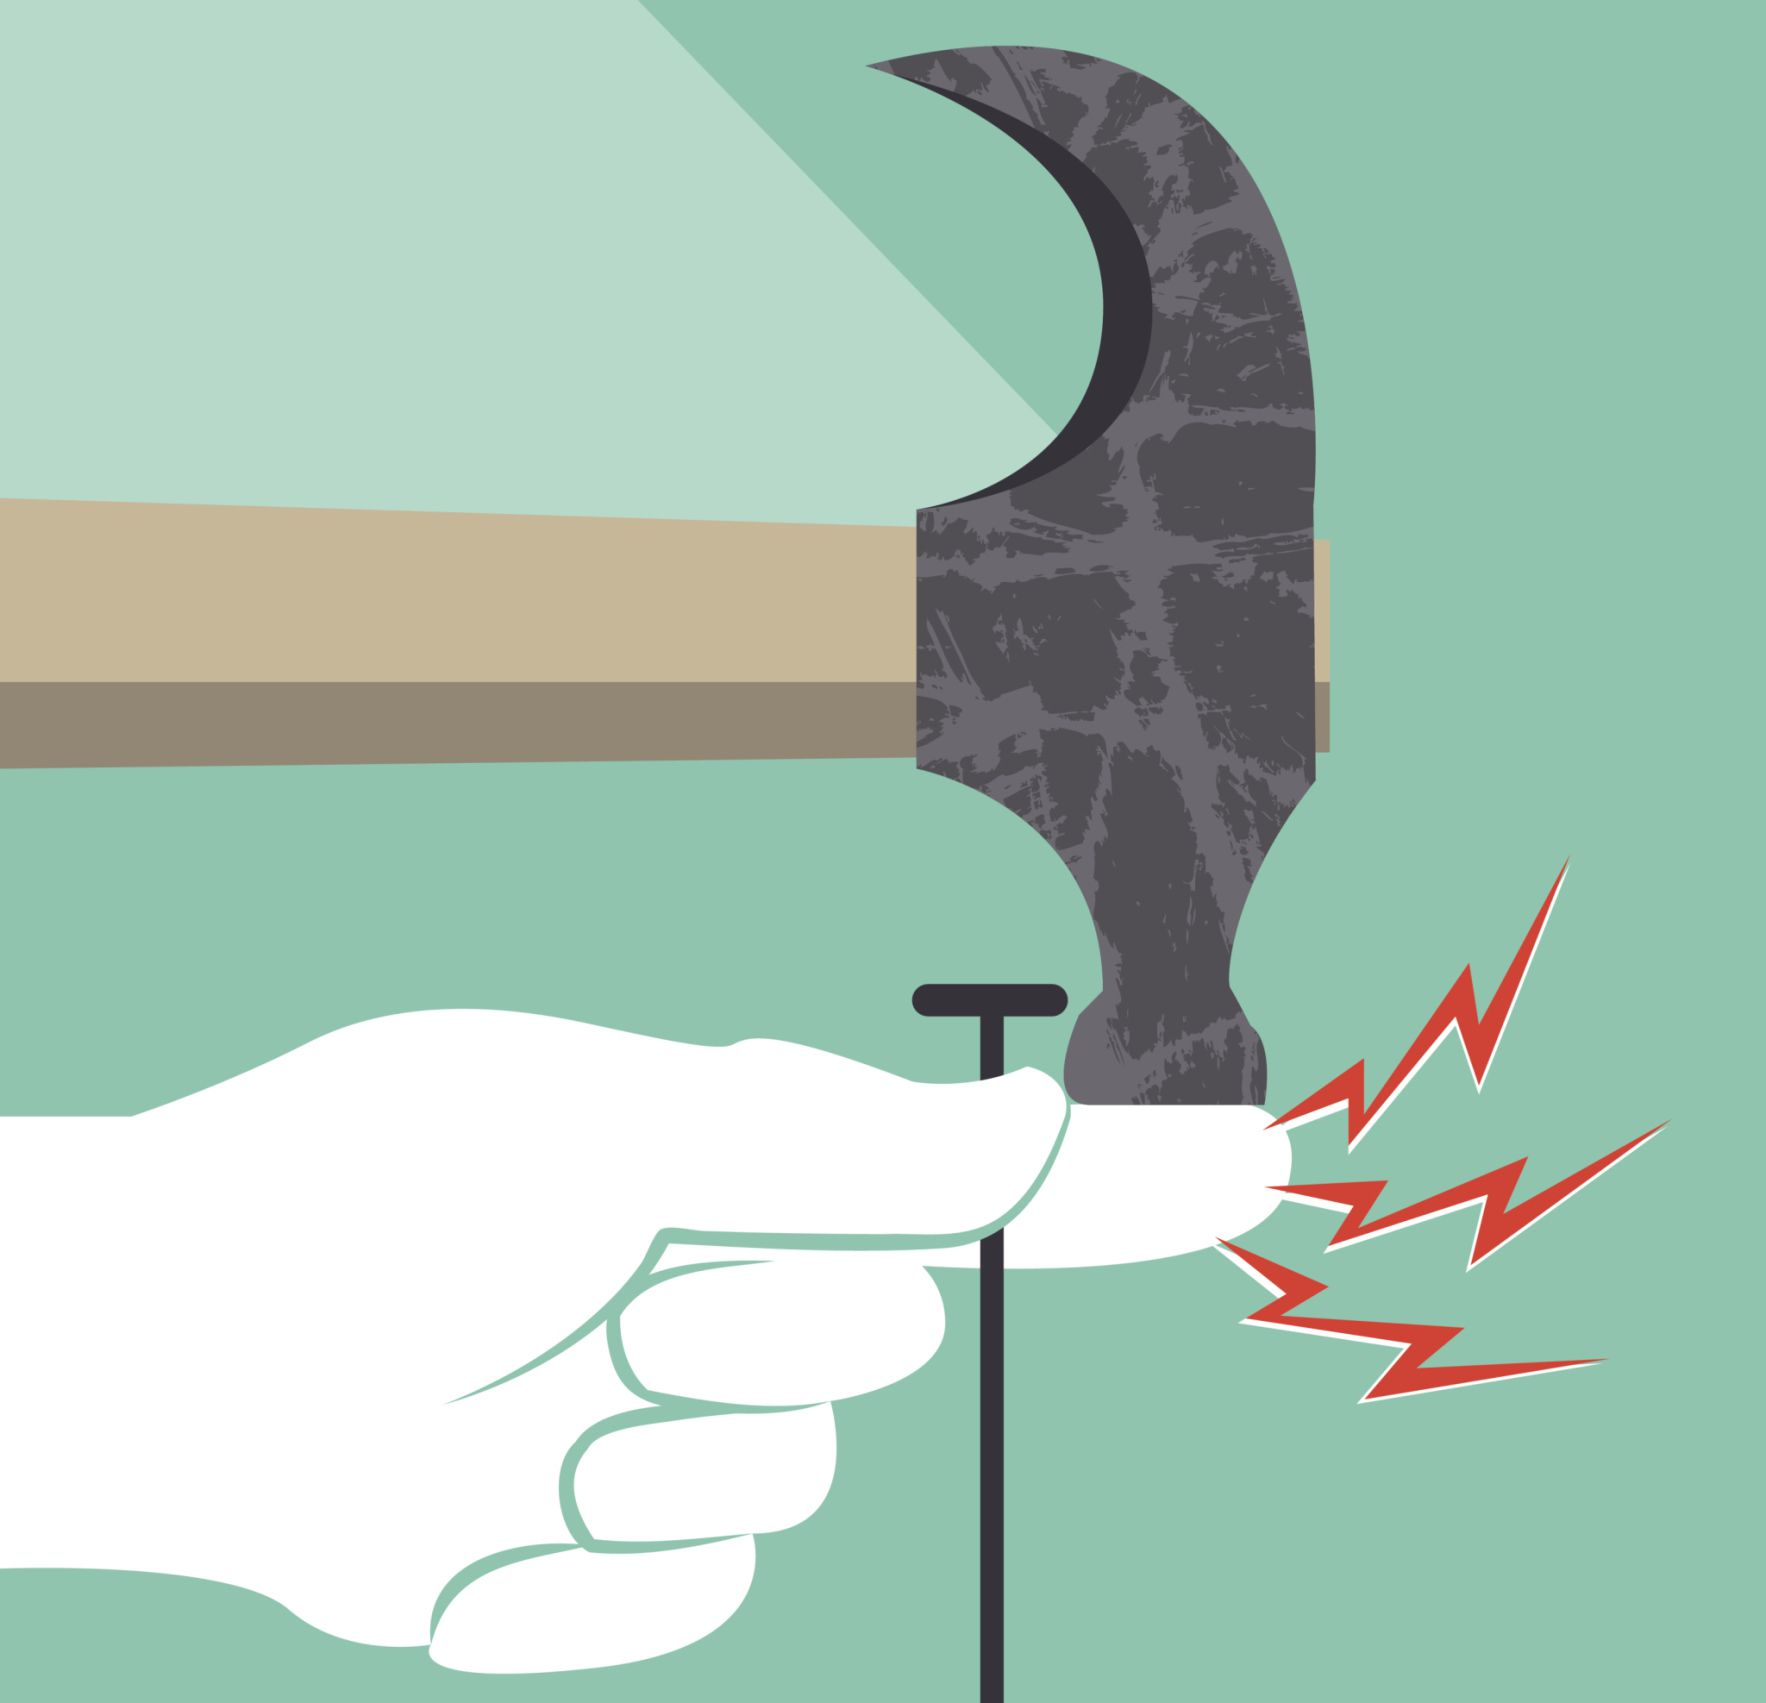 Hitting Finger With Hammer